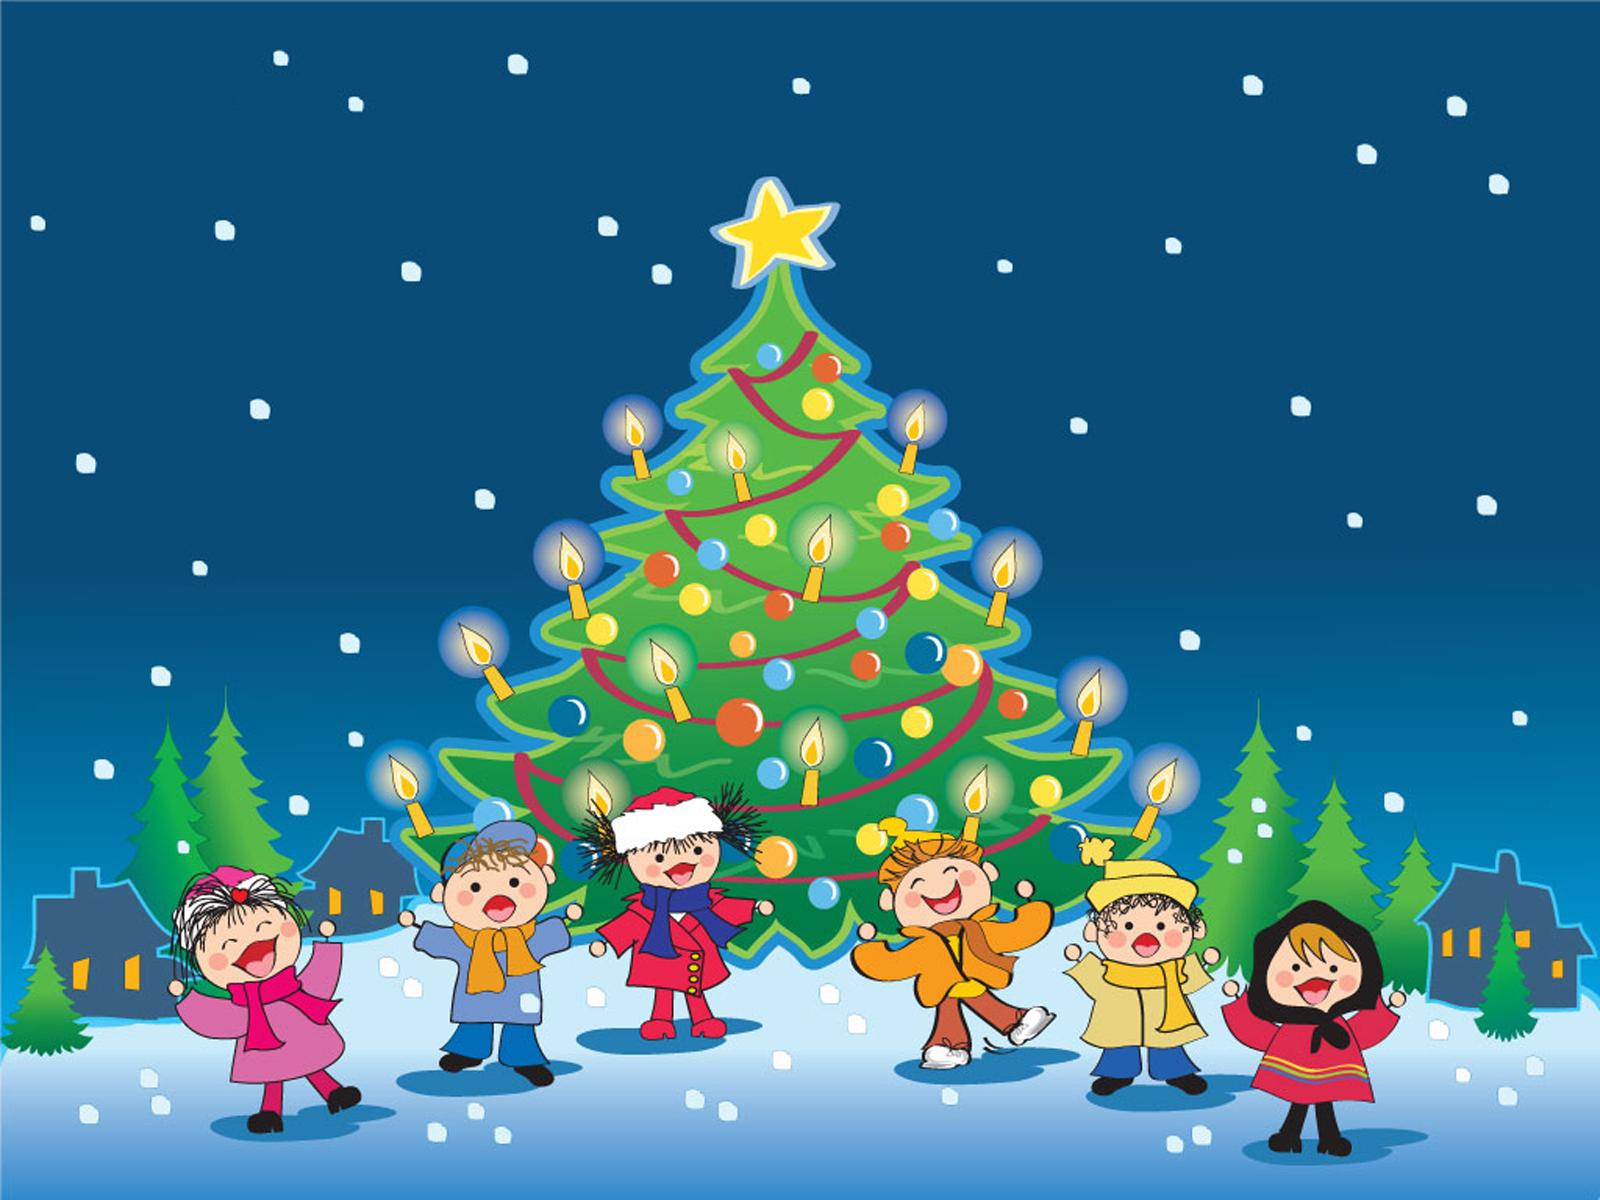 Christmas Children computer desktop wallpapers pictures images 1600x1200